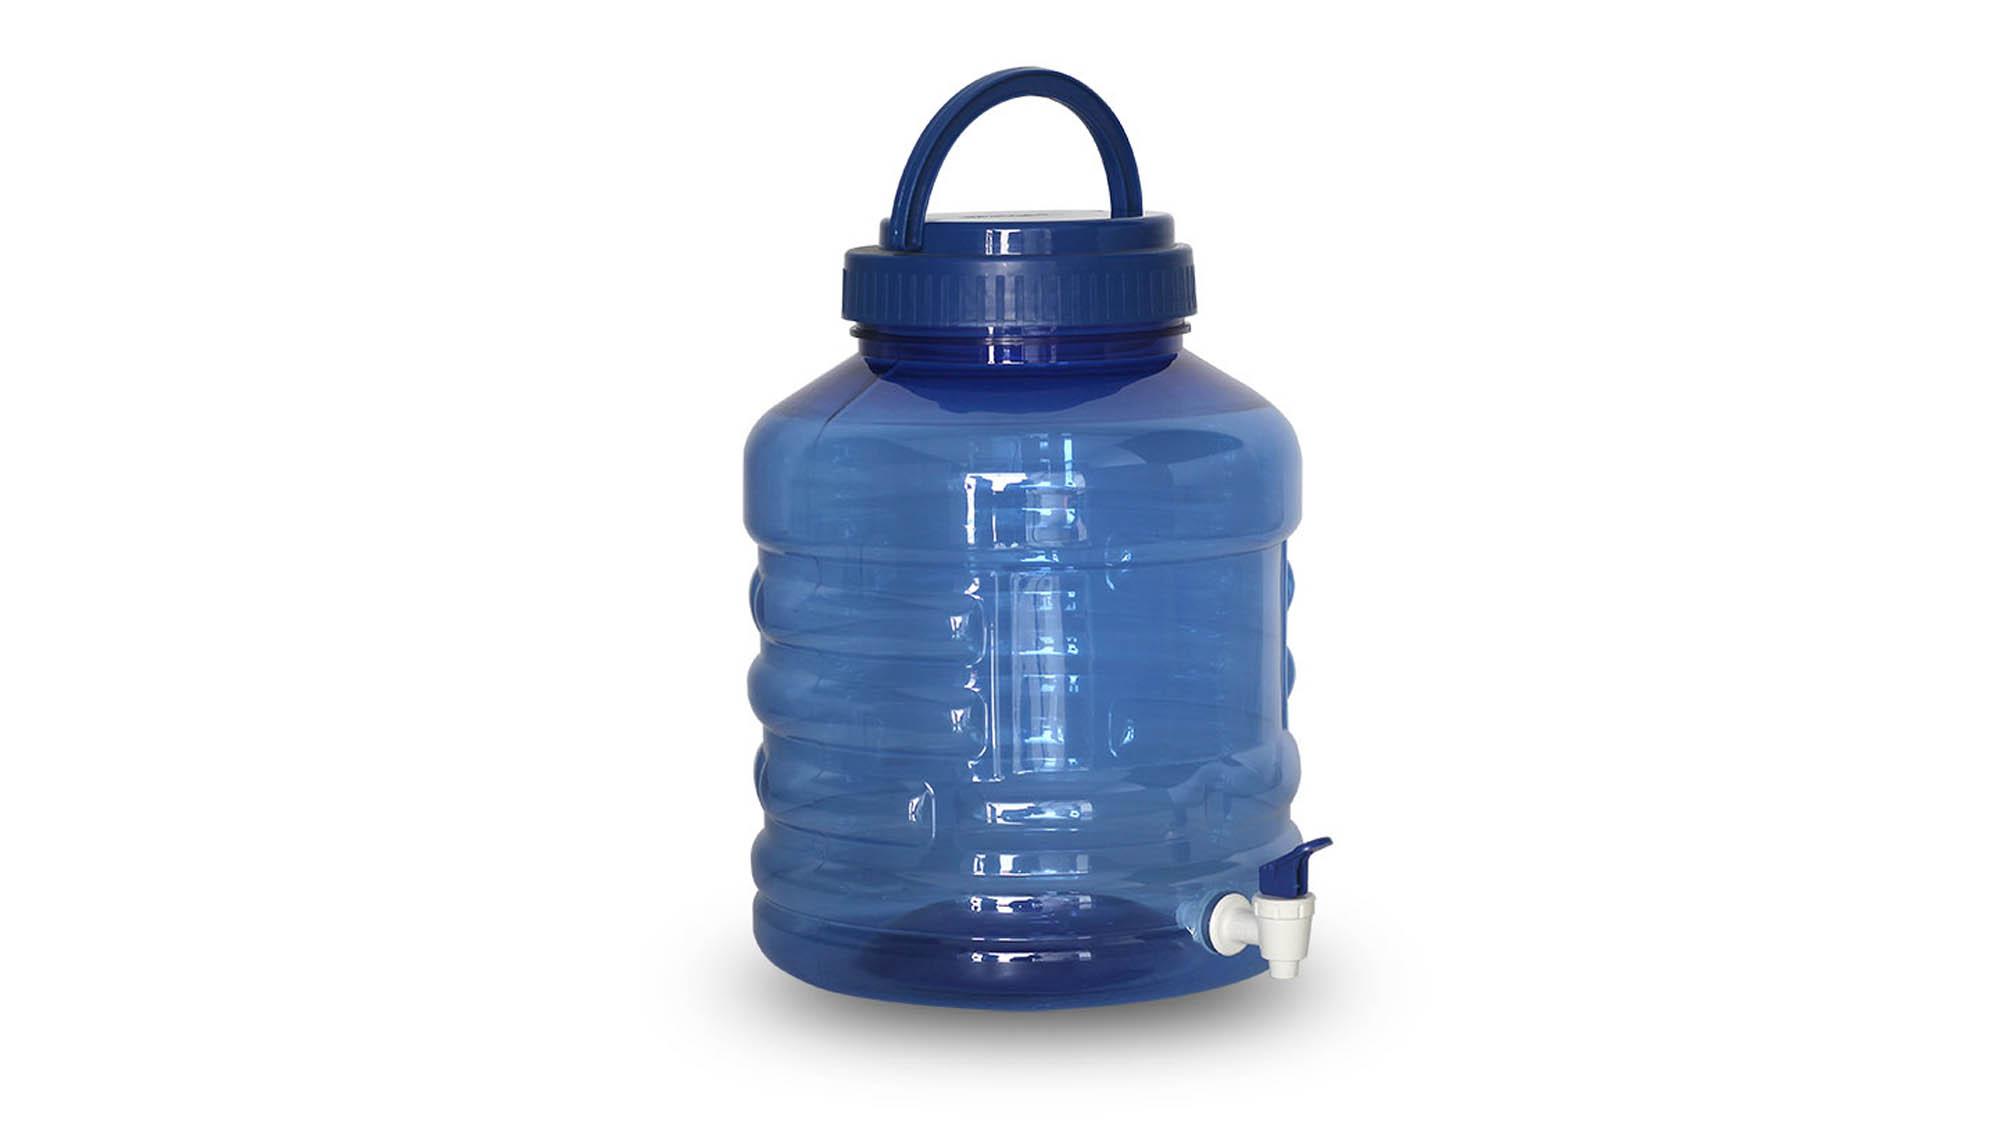 1 galon berapa liter